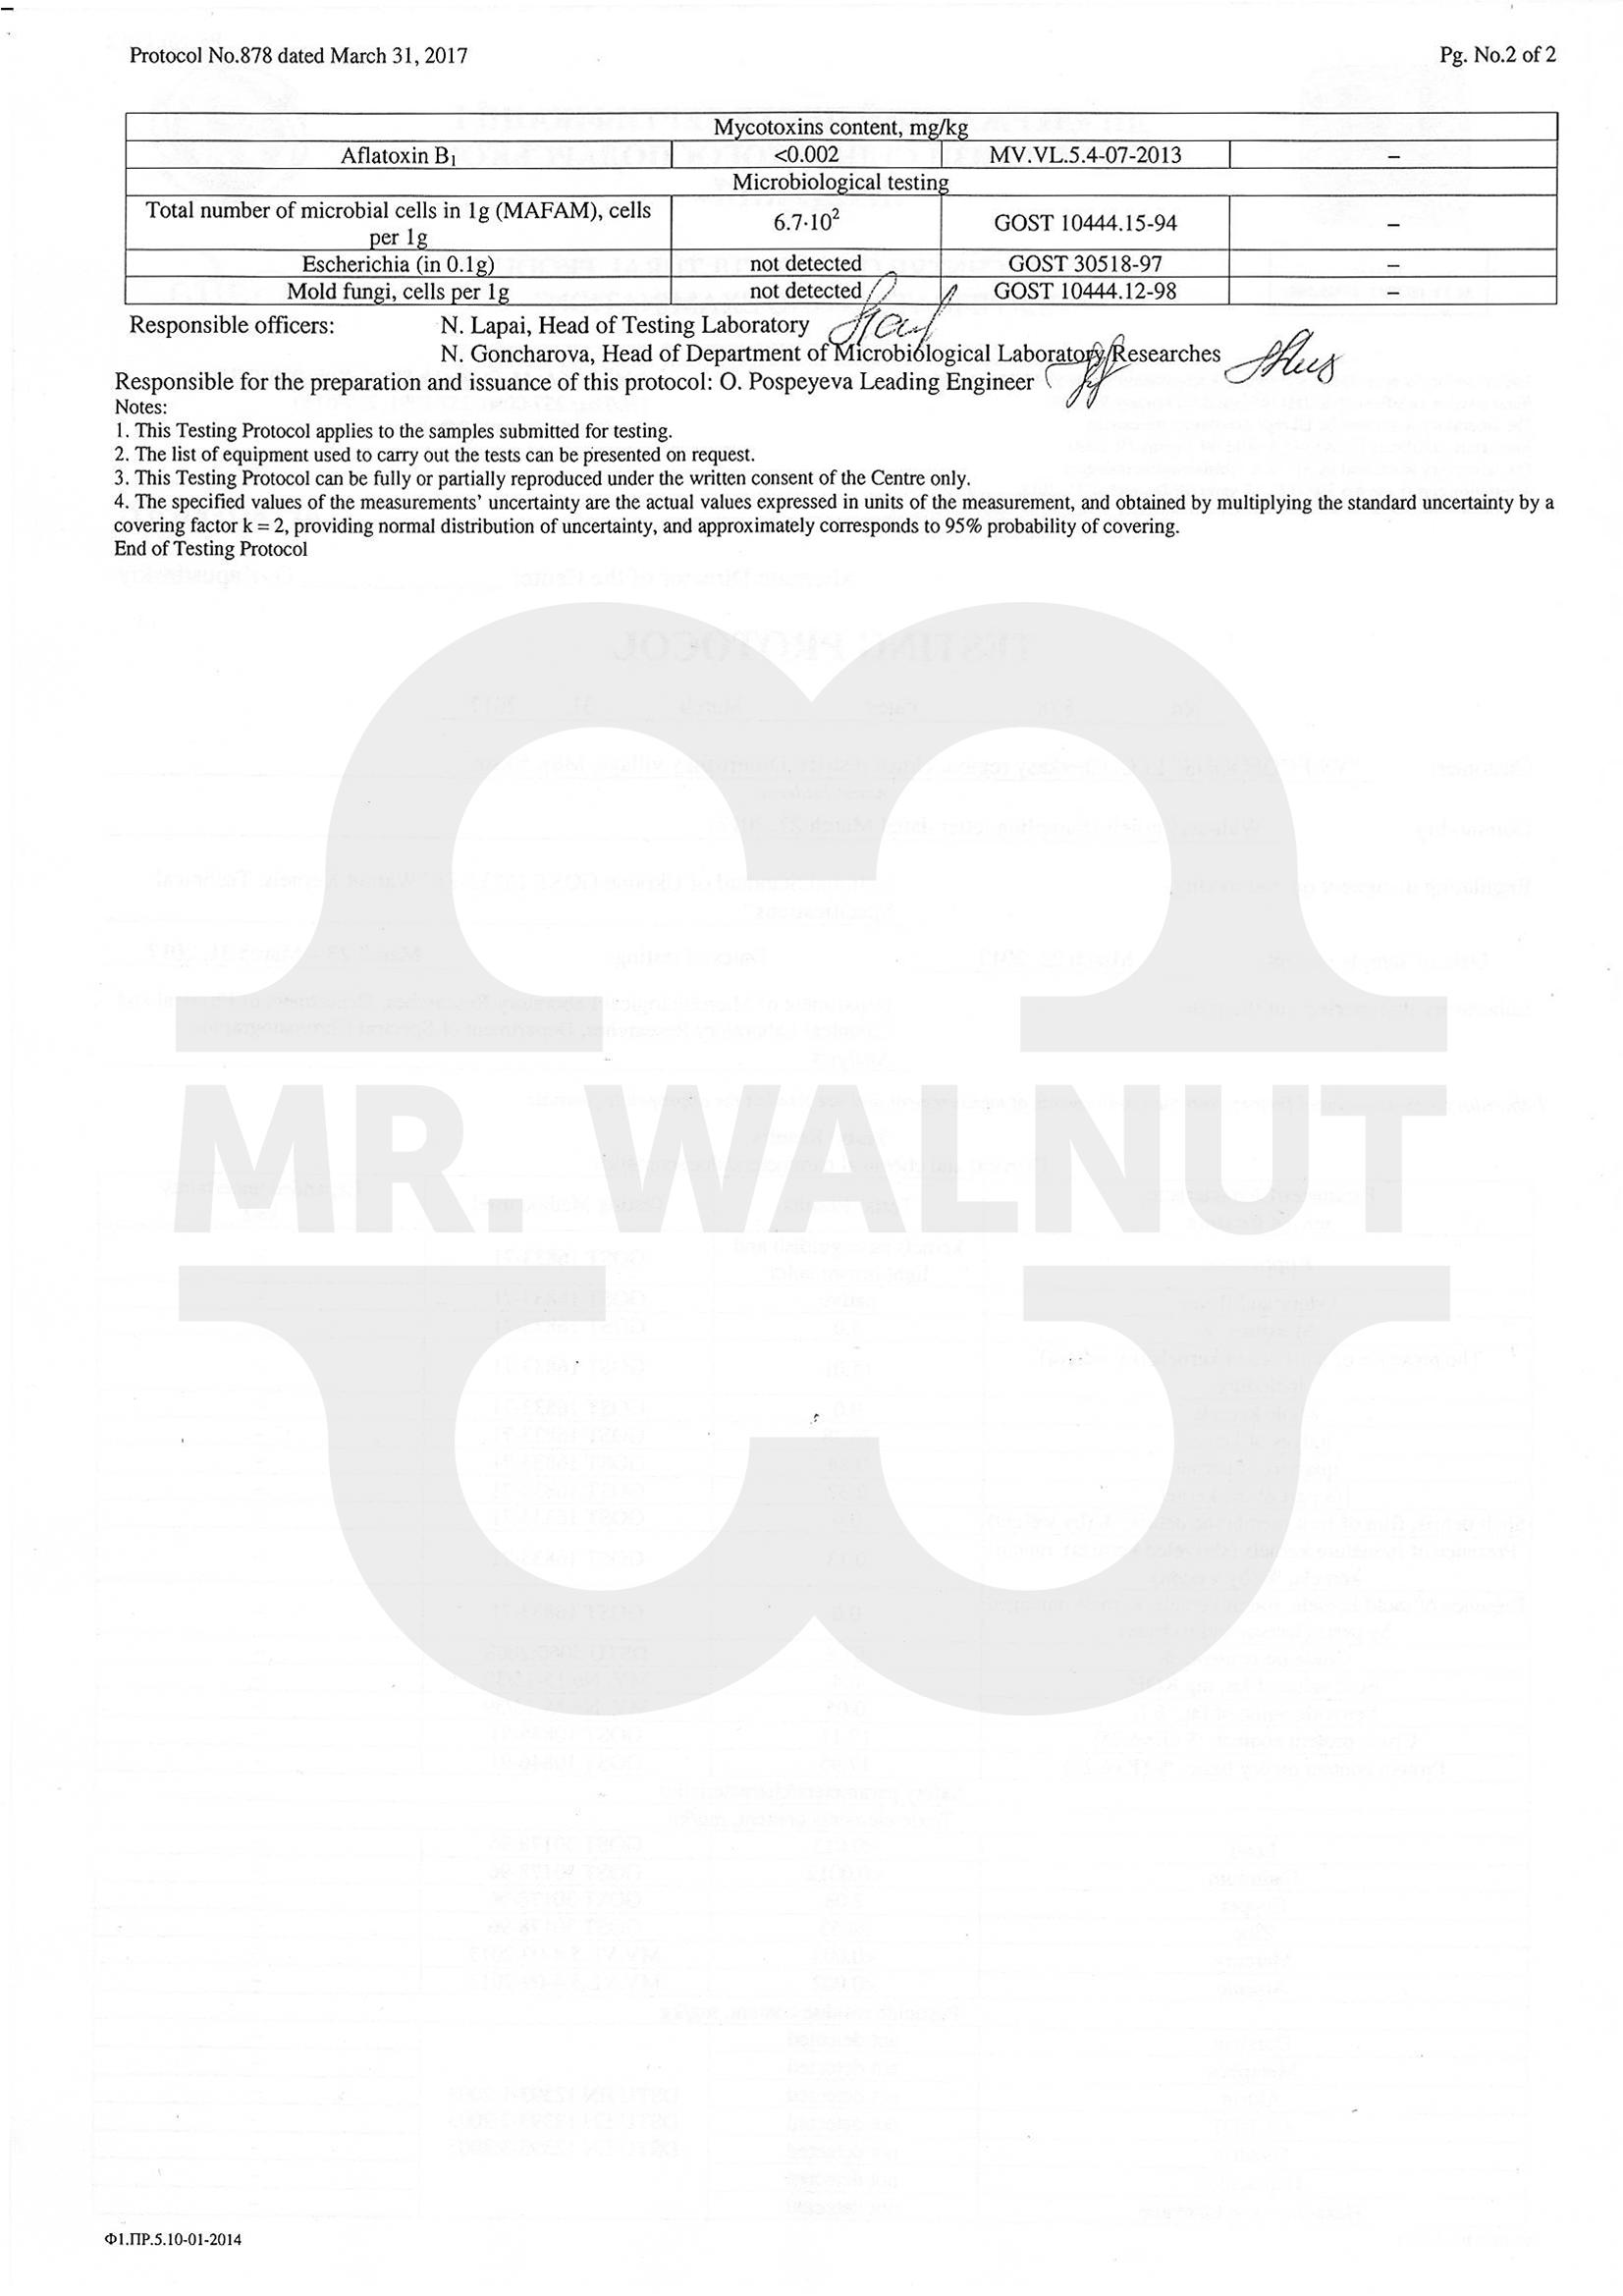 protokol878b-е2